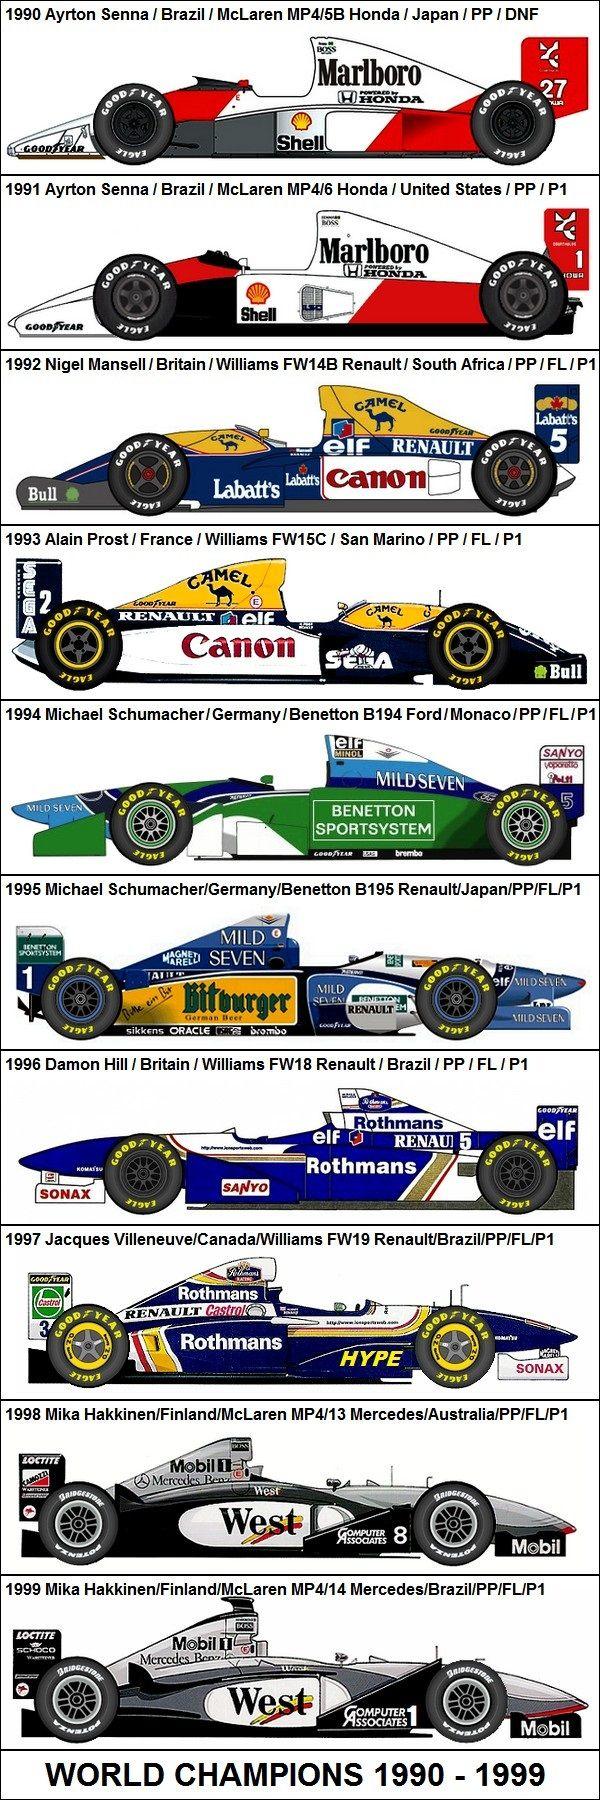 Formula One Grand Prix World Champions 1990-1999